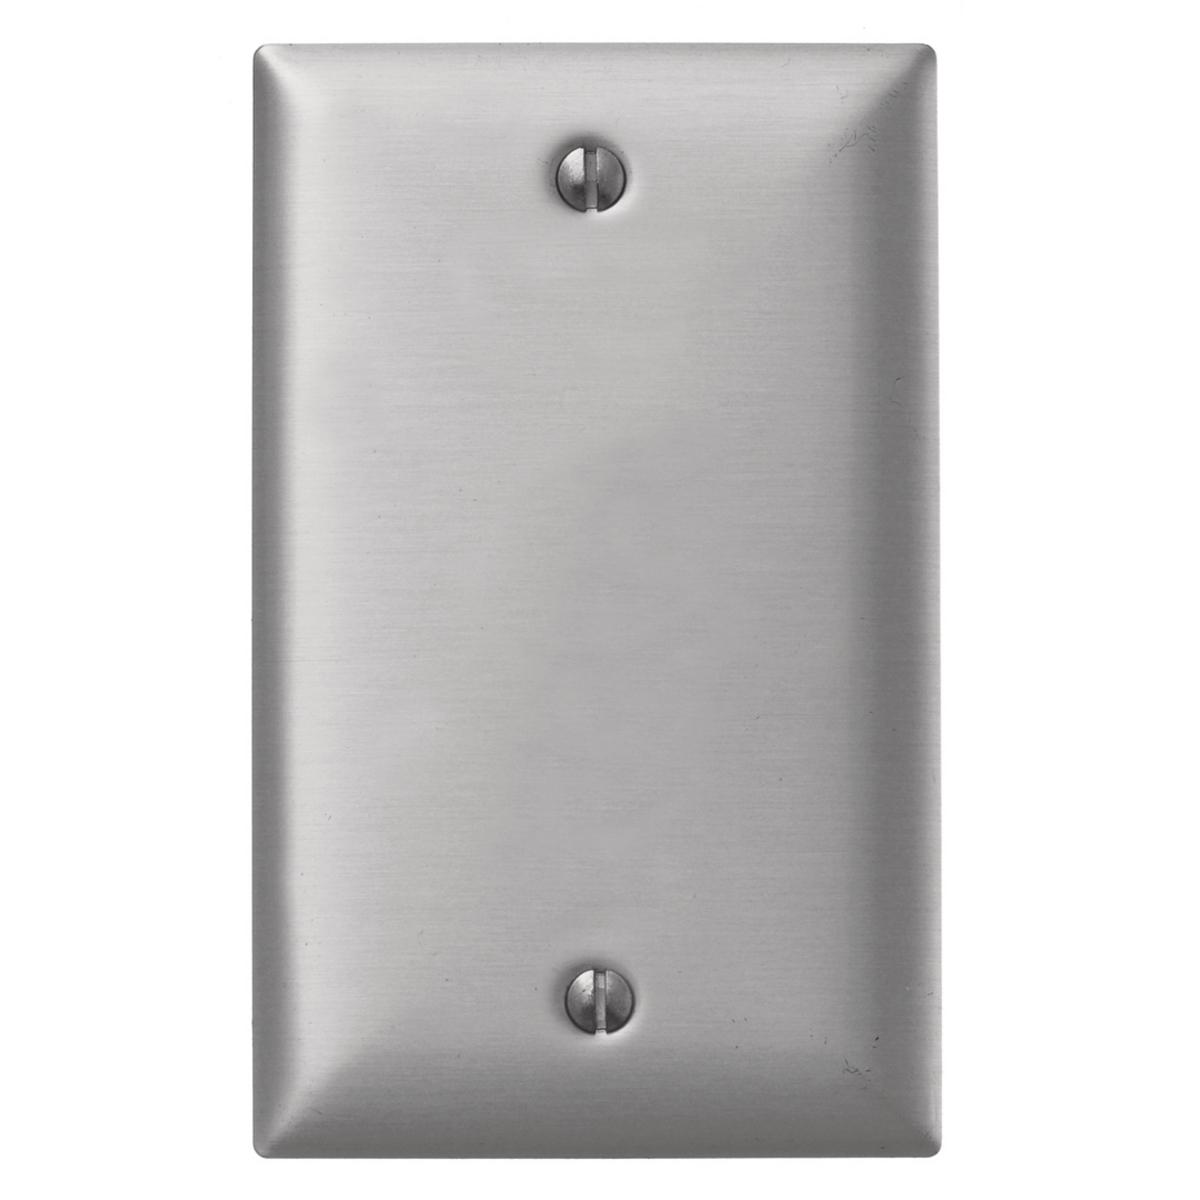 Hubbell SA13A Blank Wall Plate